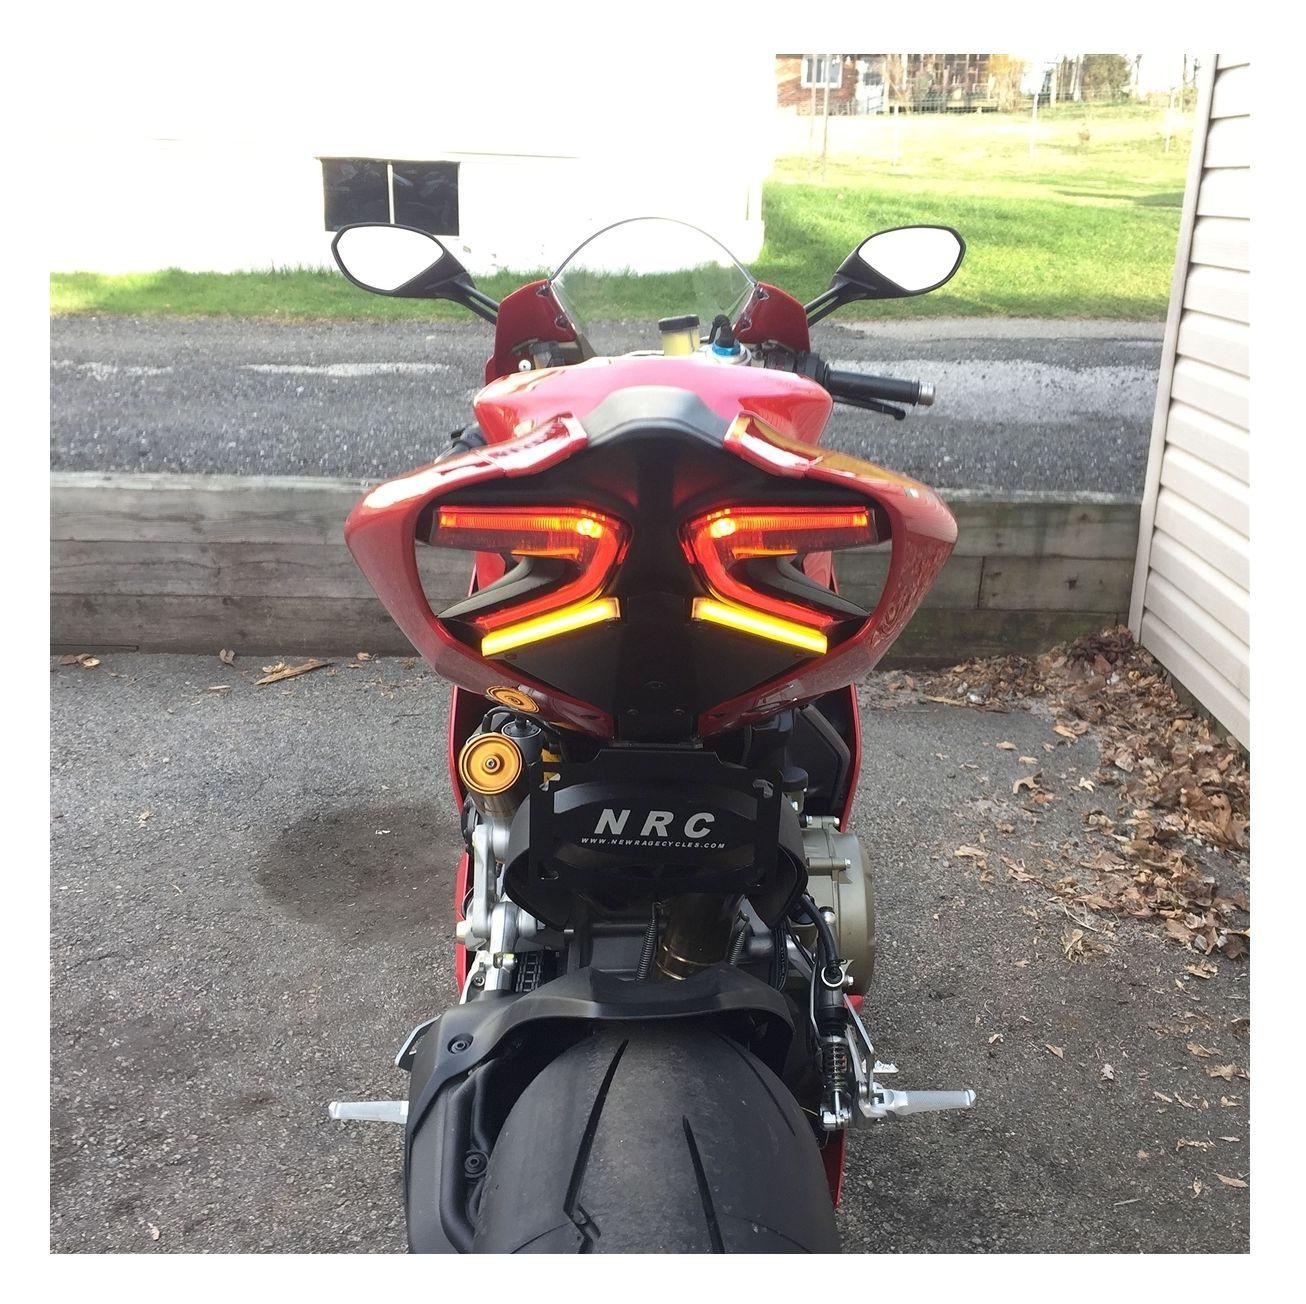 New Rage Cycles Led Fender Eliminator Ducati 1299 Panigale Revzilla Ducati  848 Ecu Wiring Diagram Ducati 1299s Wiring Diagram